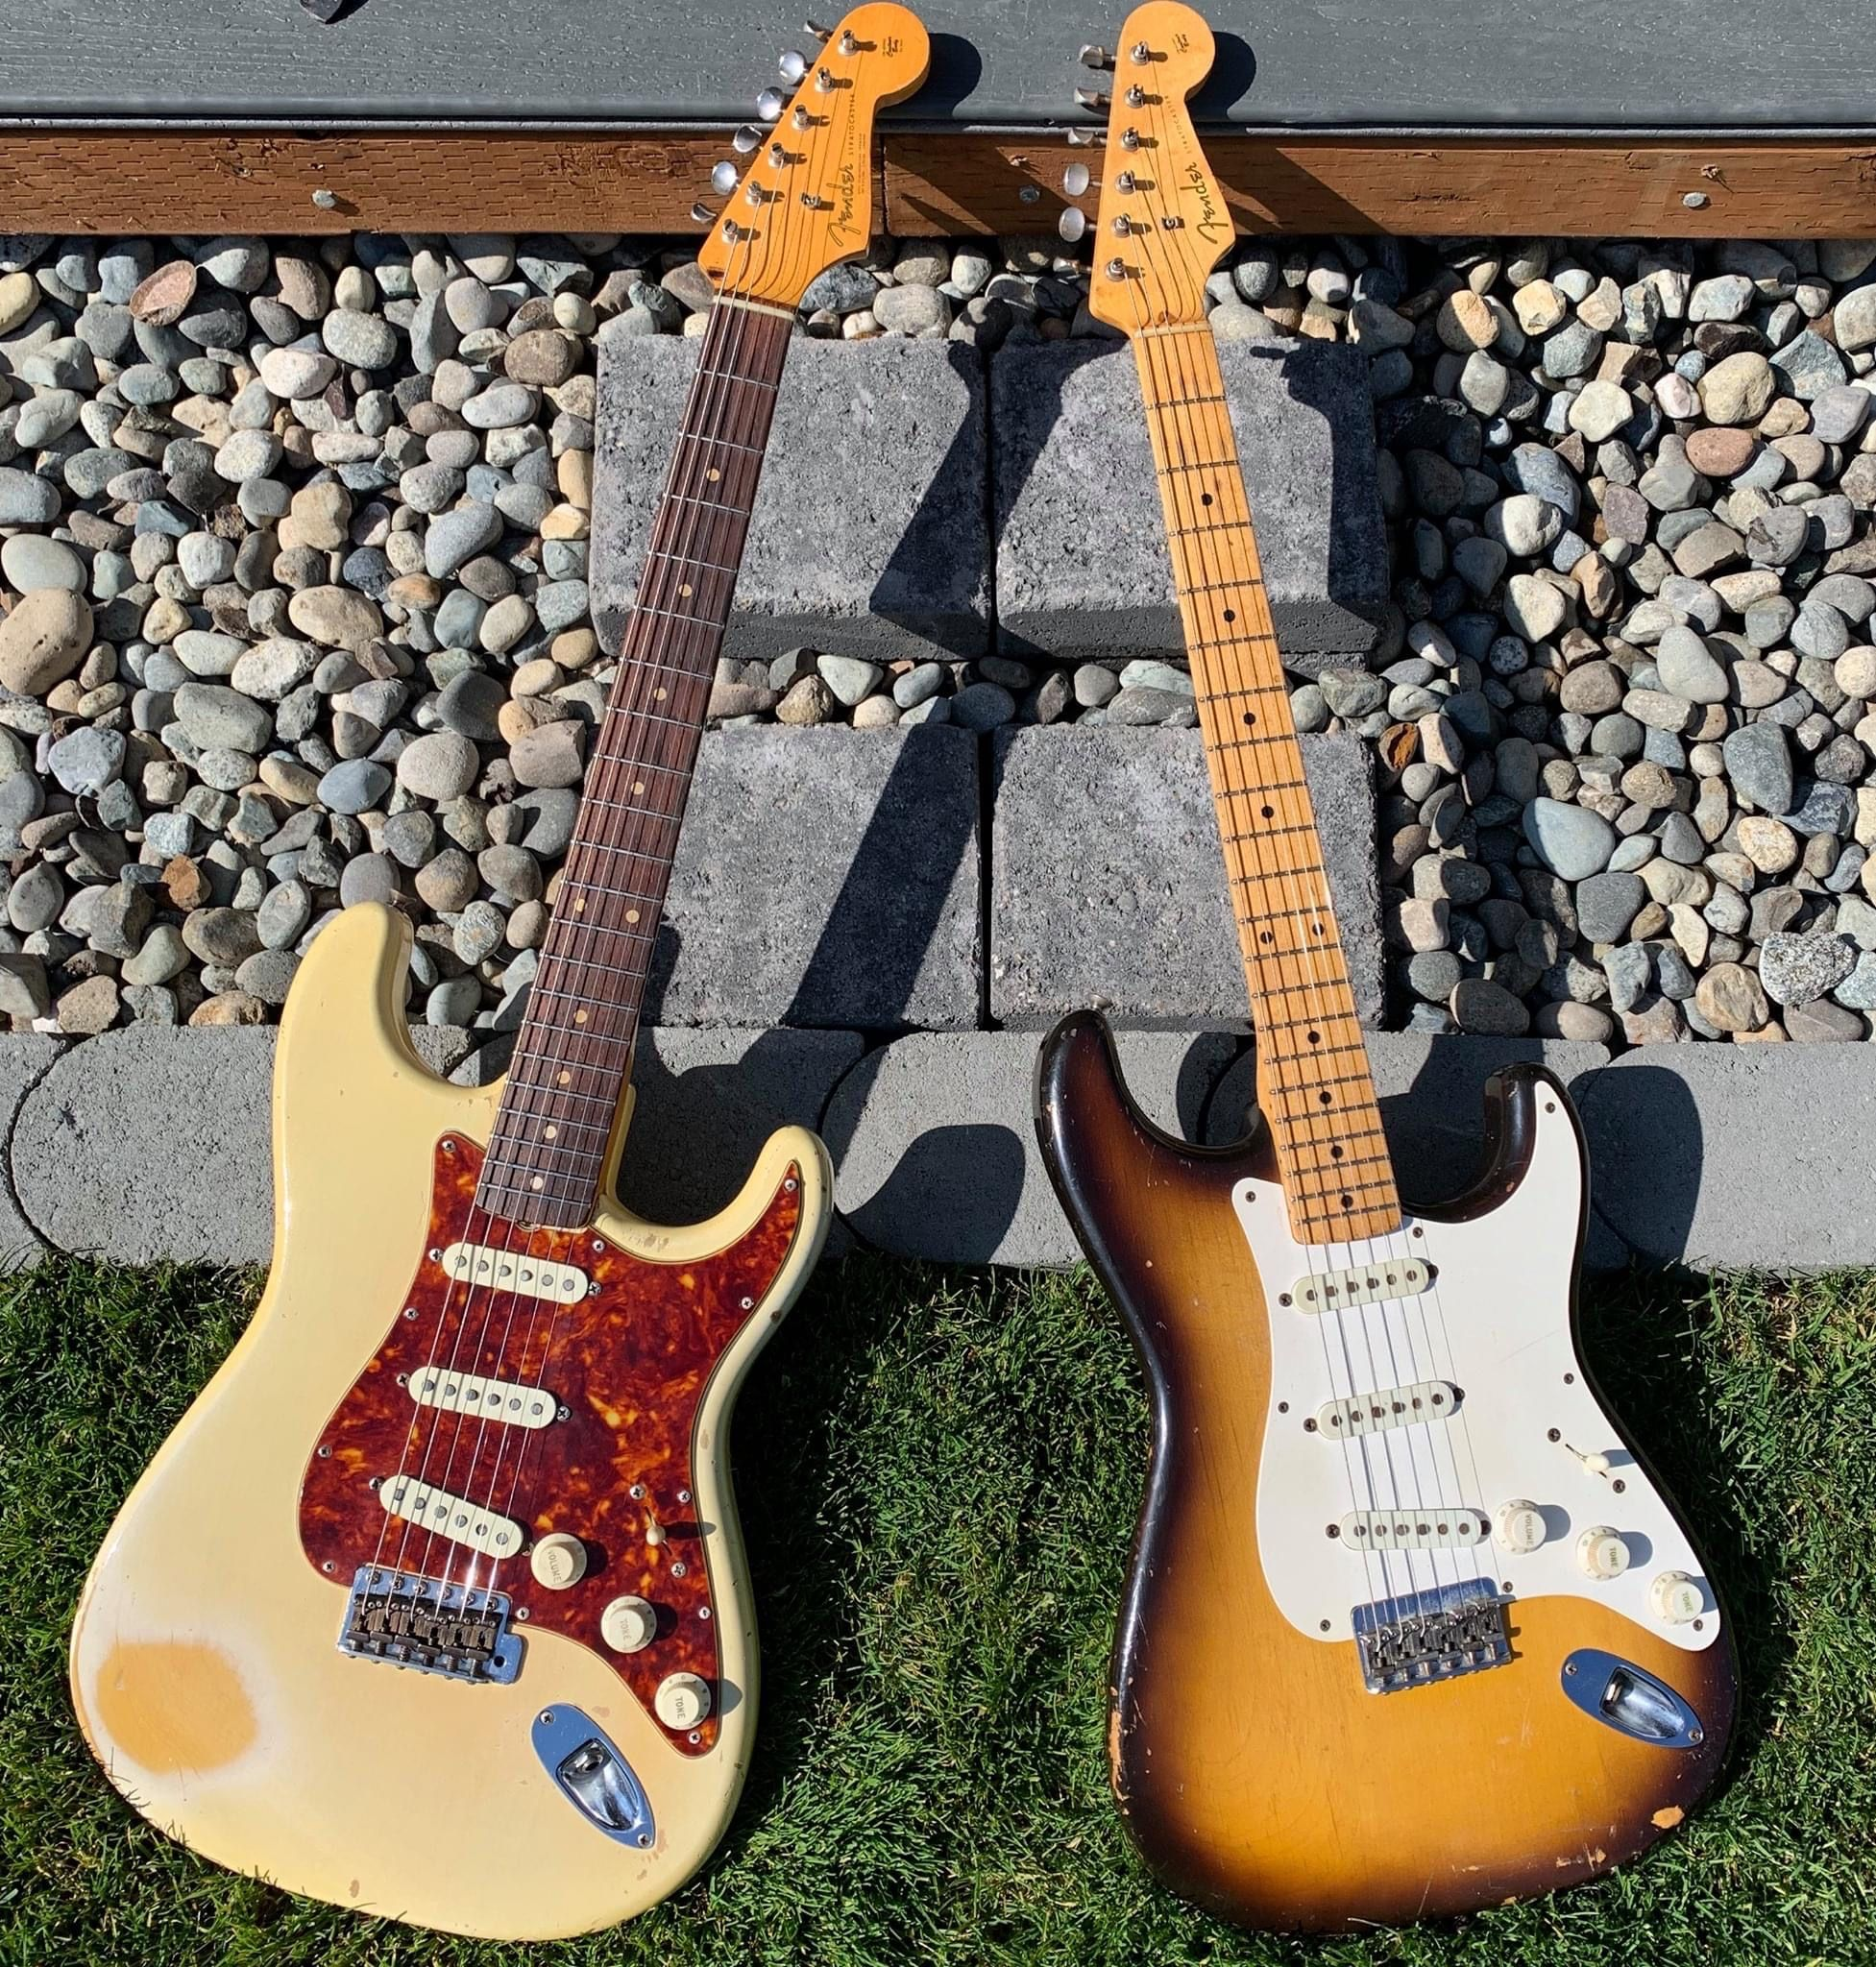 Pin By Moon 64 On Eyegasm Guitar Fender Stratocaster Fender Guitars